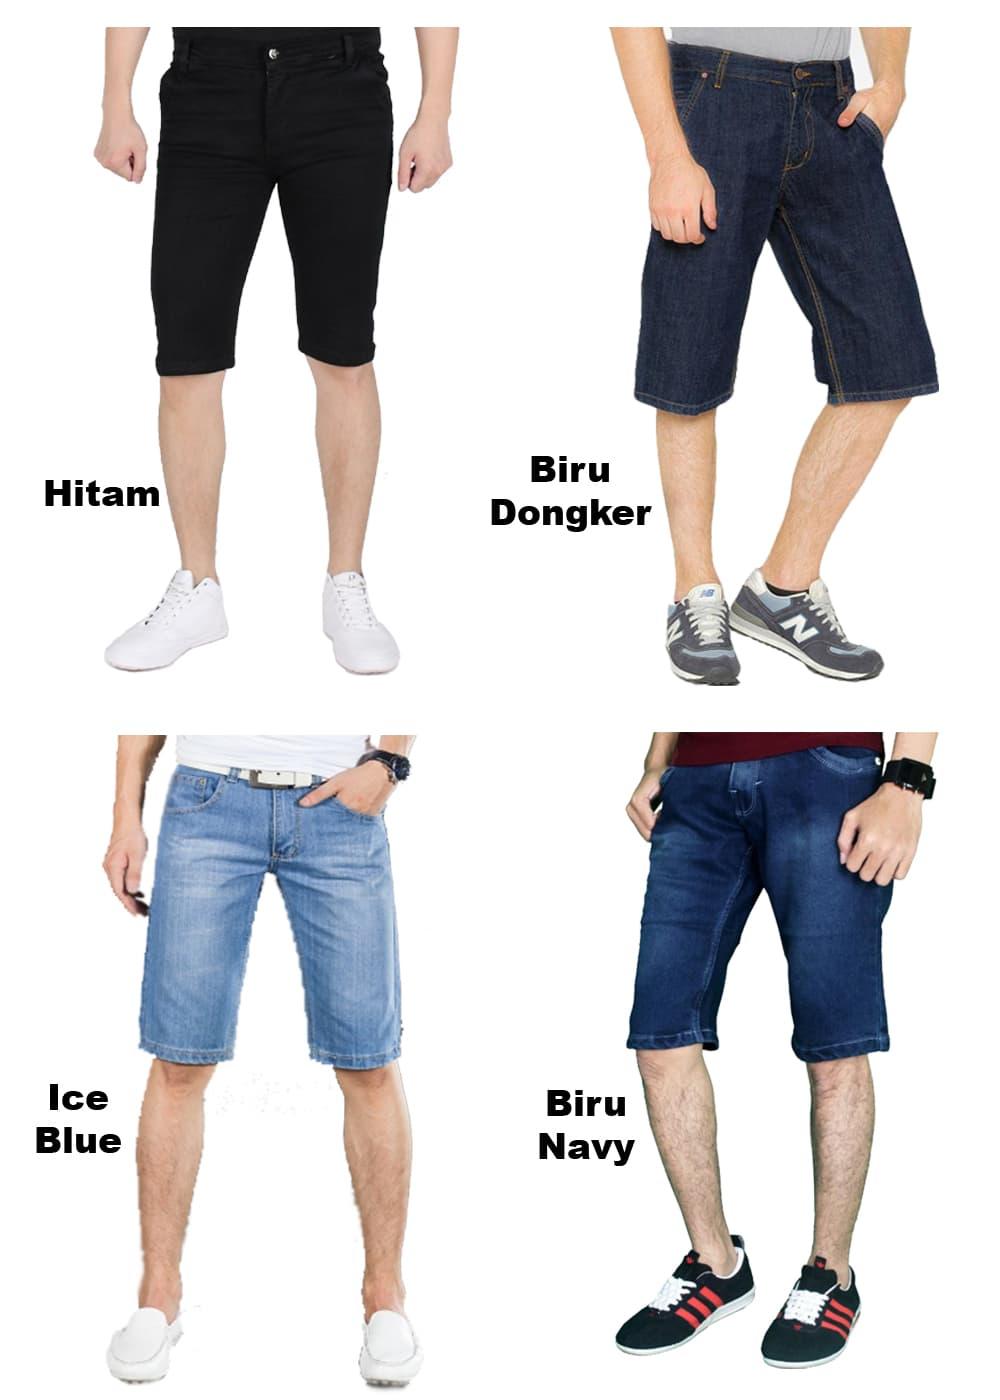 Jual Celana Pendek Tcash Juli Jeans Strech Panjang Pria Model Slimfit Hitam Short